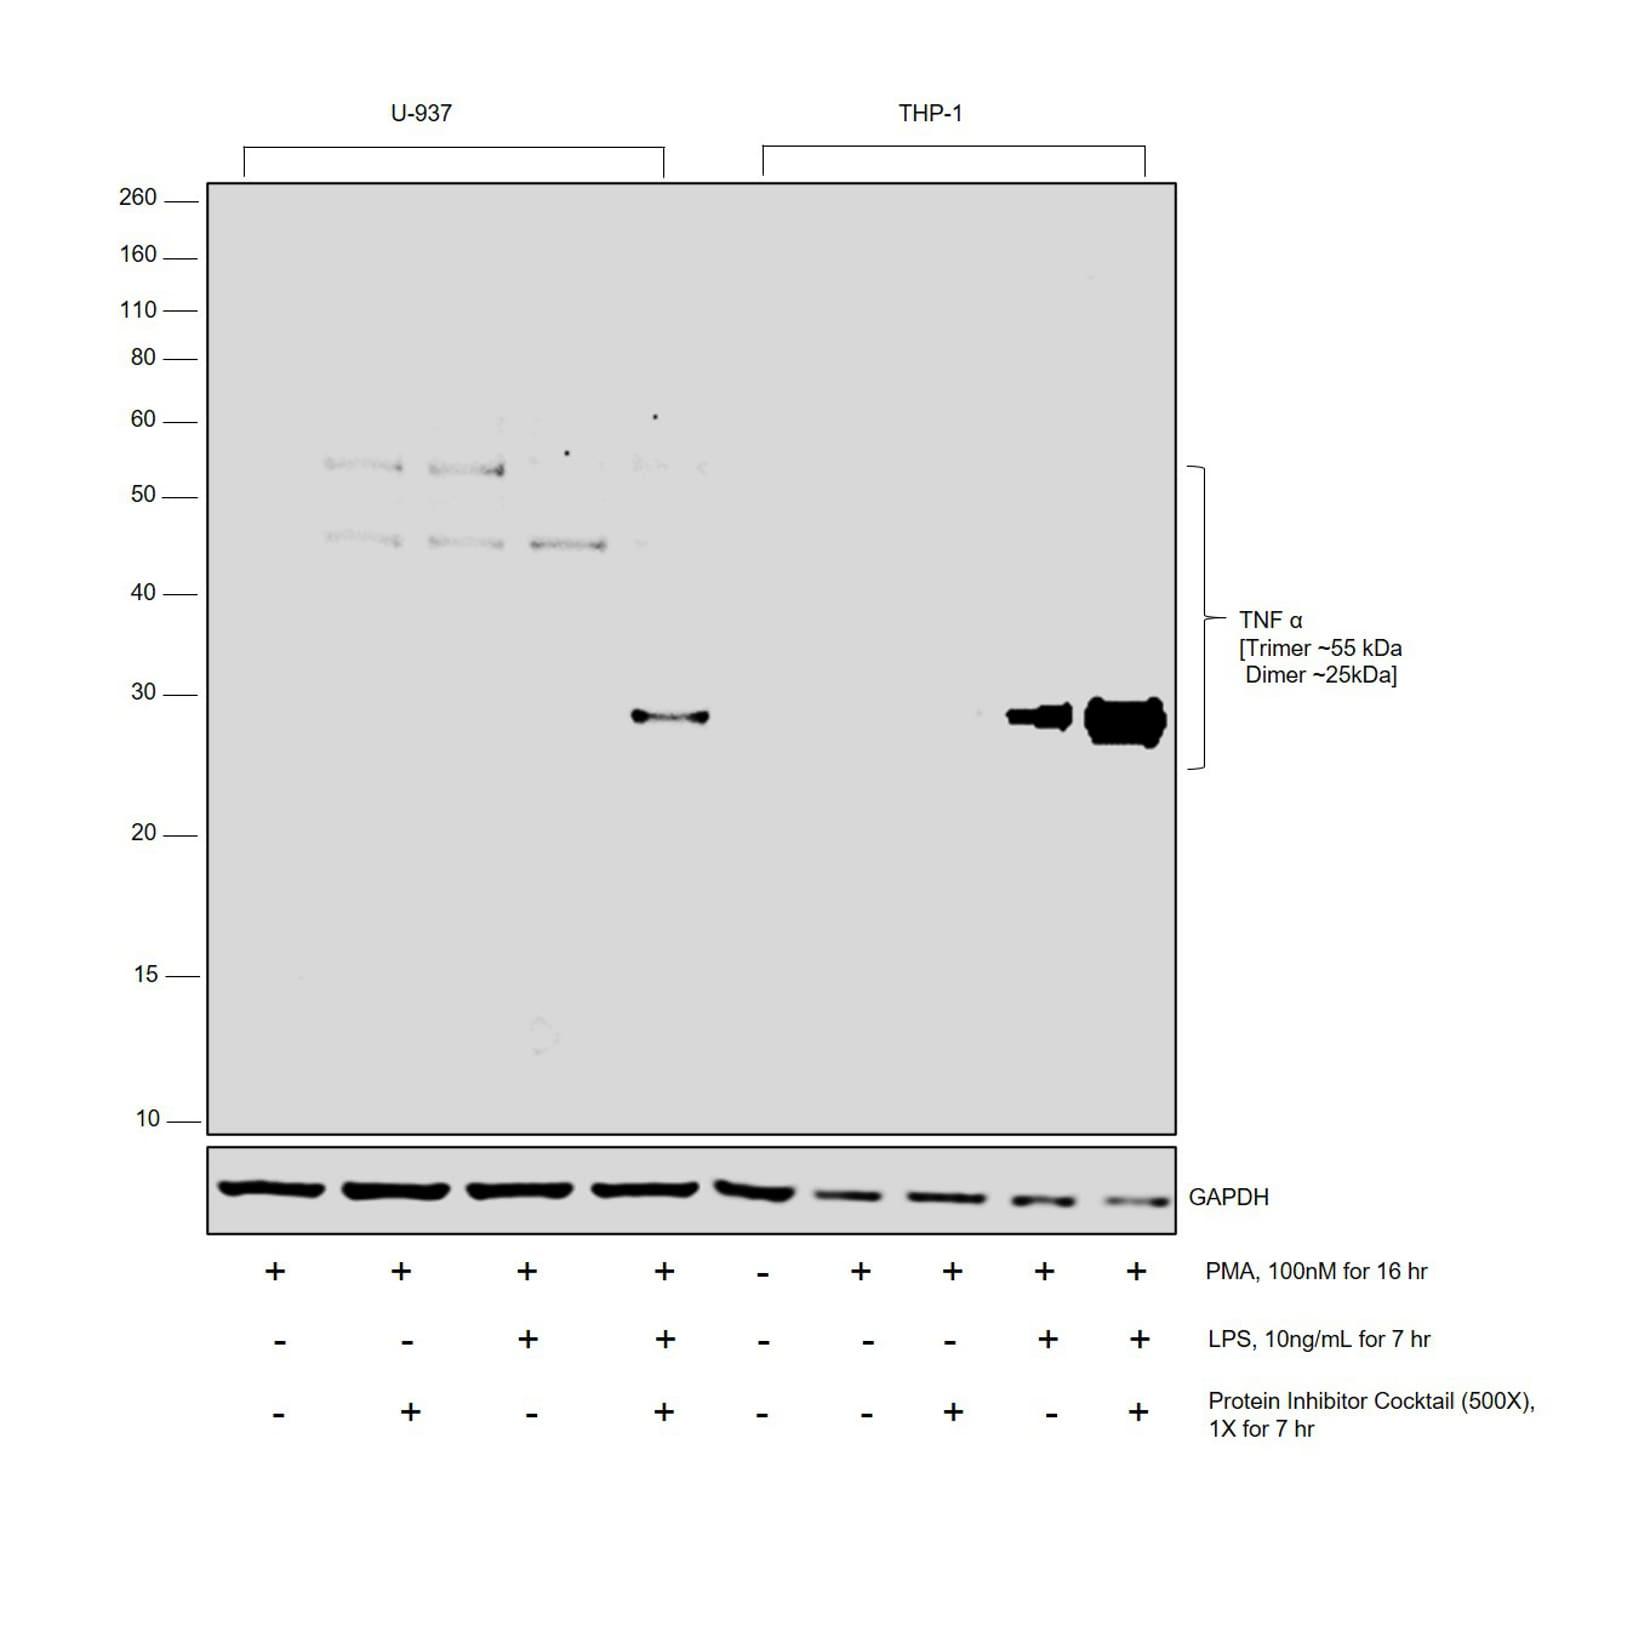 TNF alpha Antibody in Cell treatment